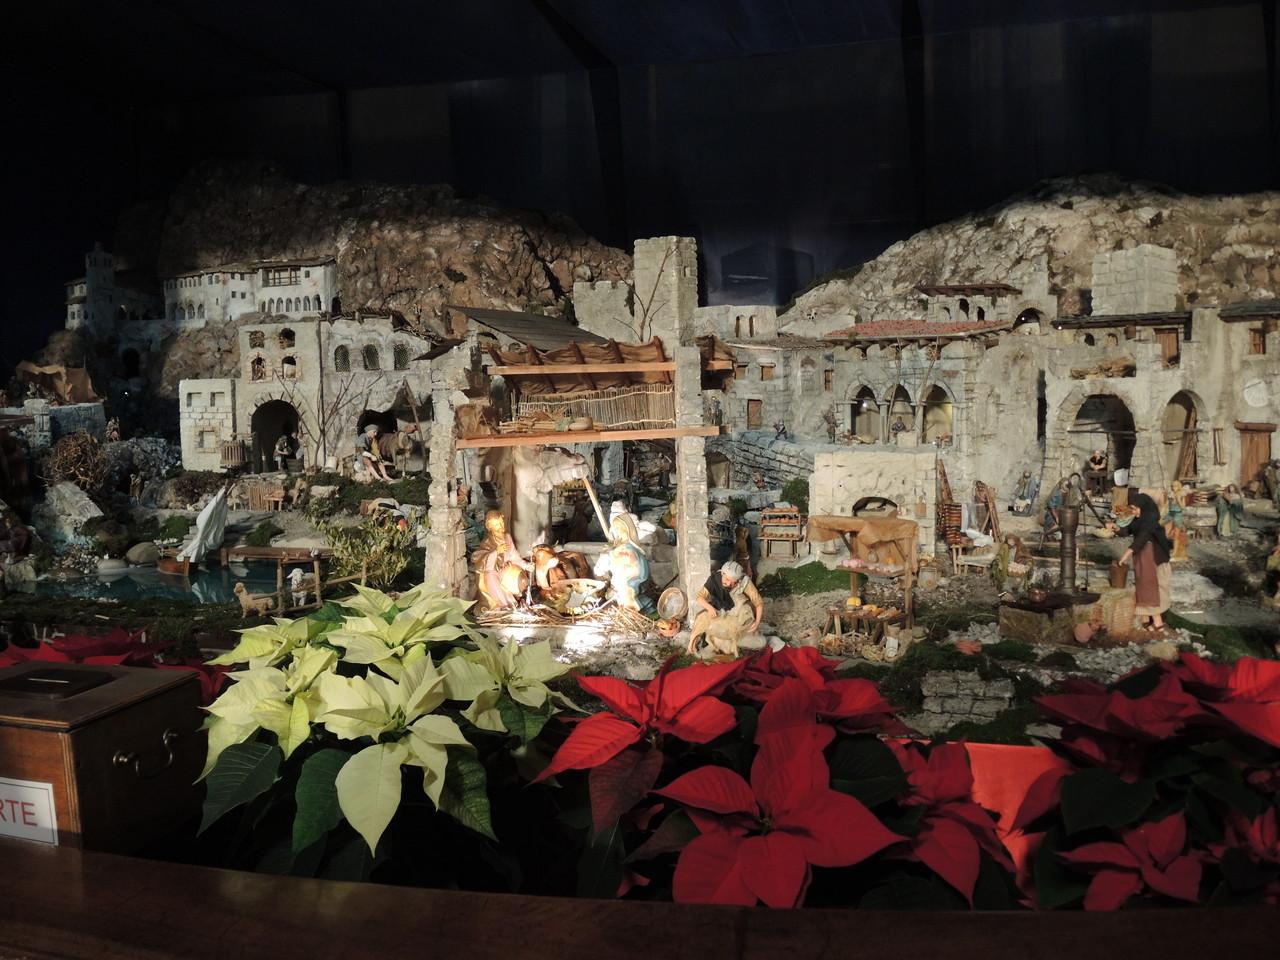 Presepe del Duomo